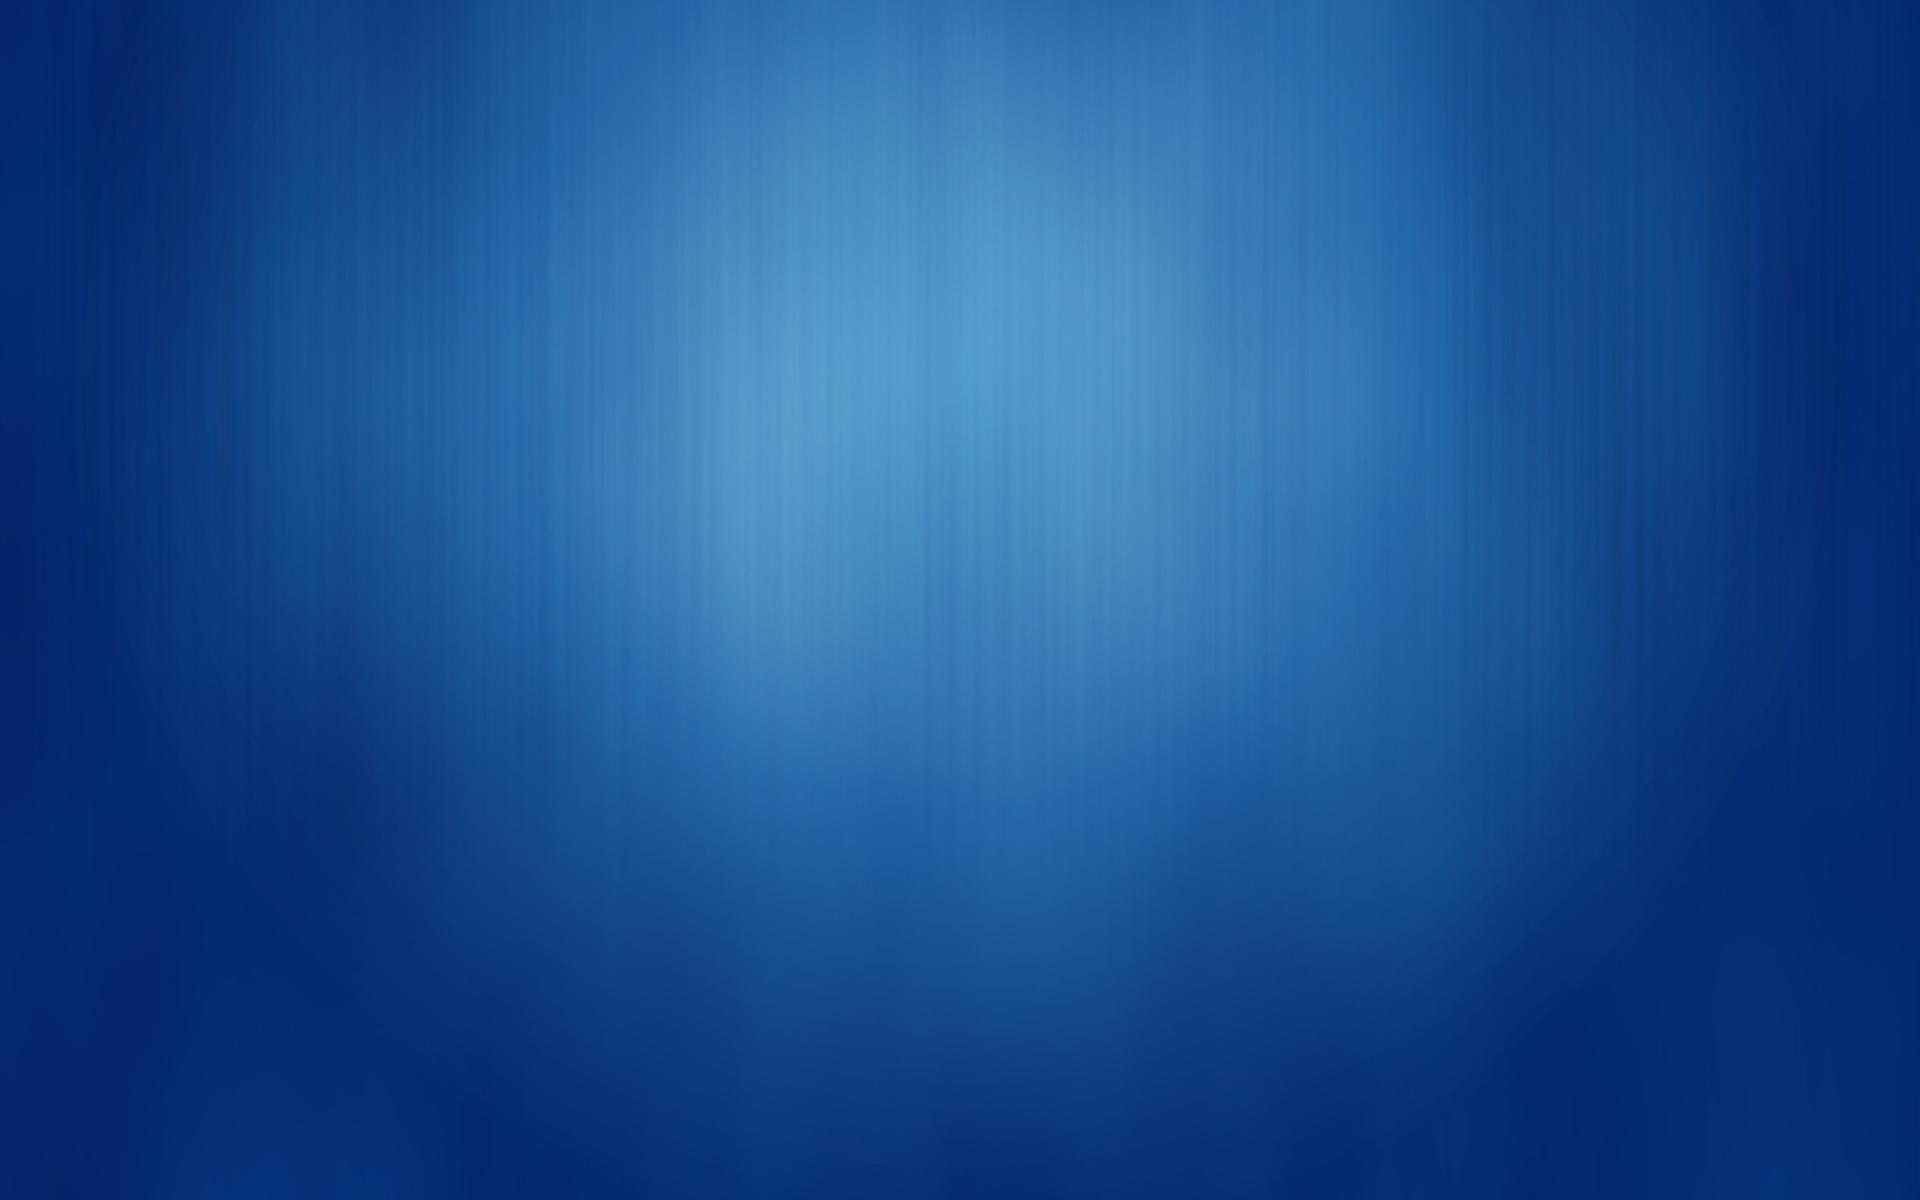 Full Screen Desktop Fall Wallpaper Blue Wallpapers Hd Pixelstalk Net